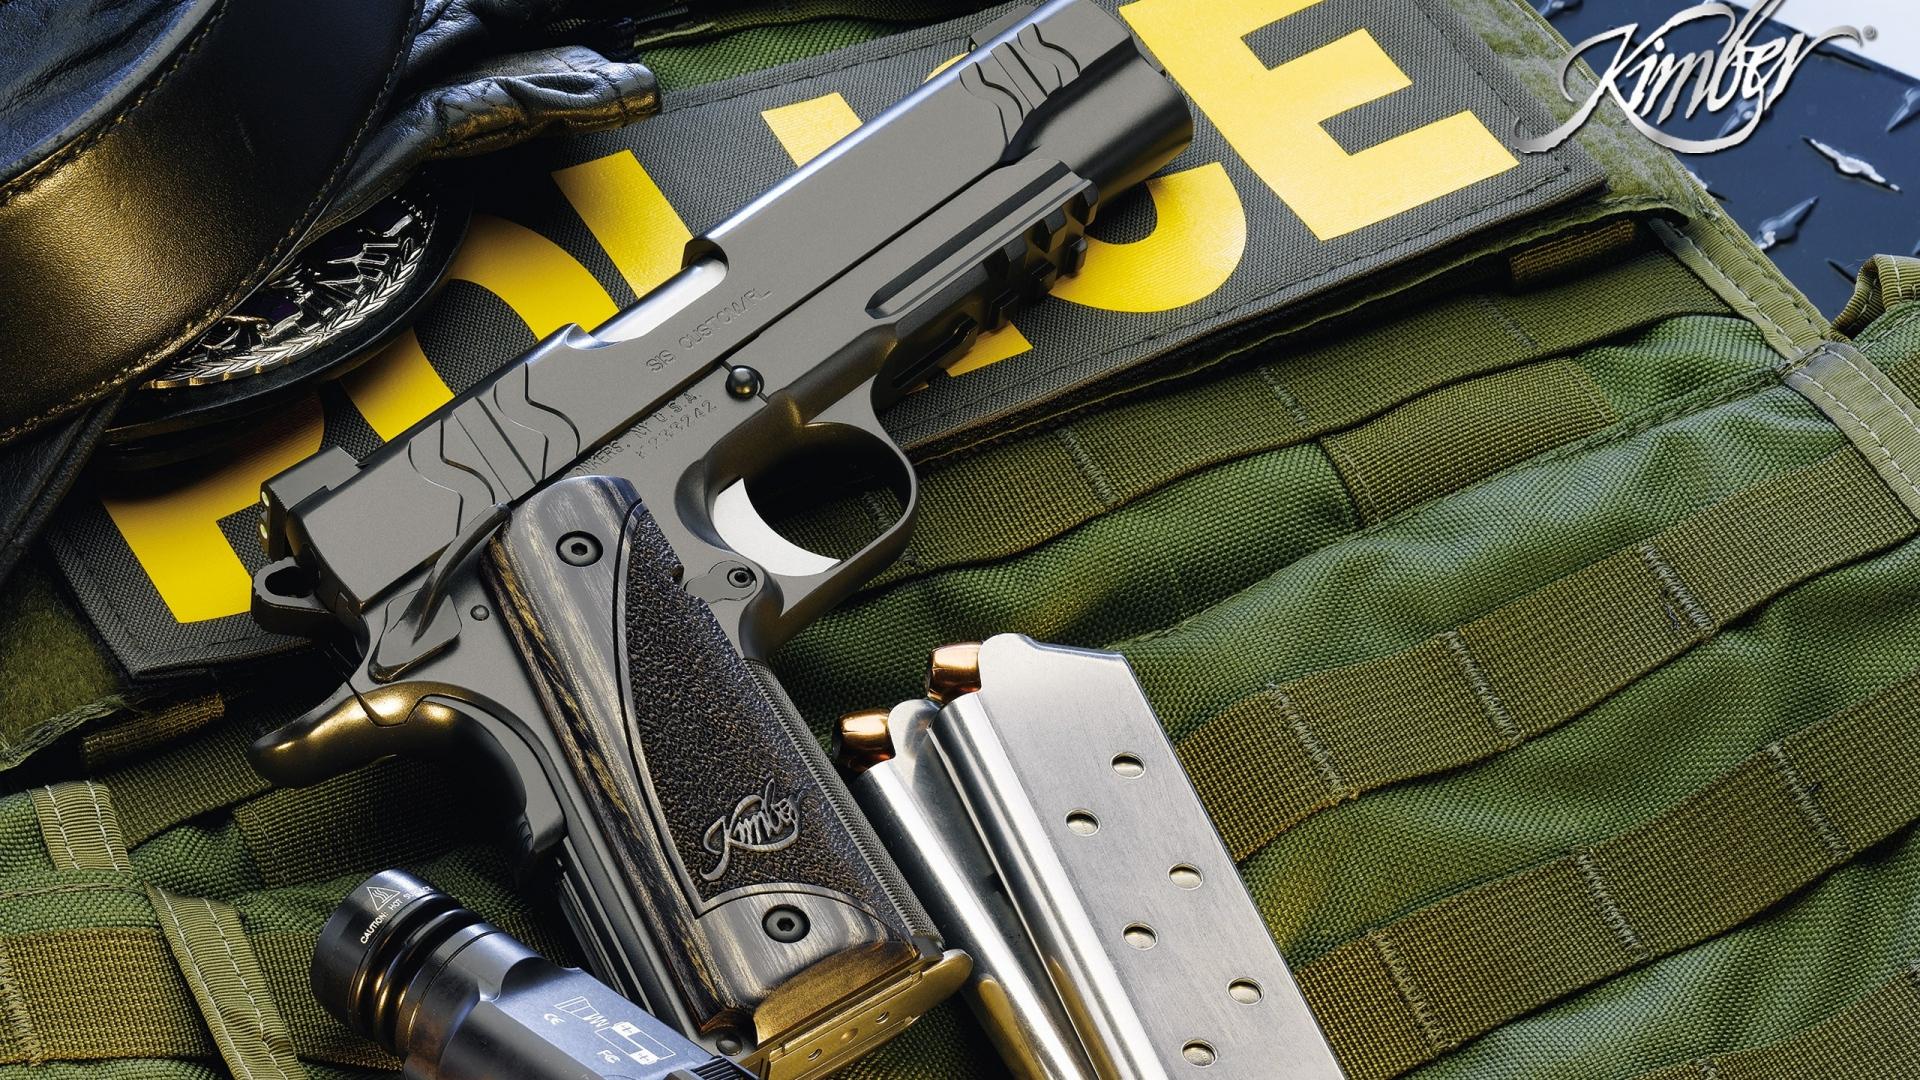 download wallpaper 1920x1080 police, guns, gun, knife, defense full